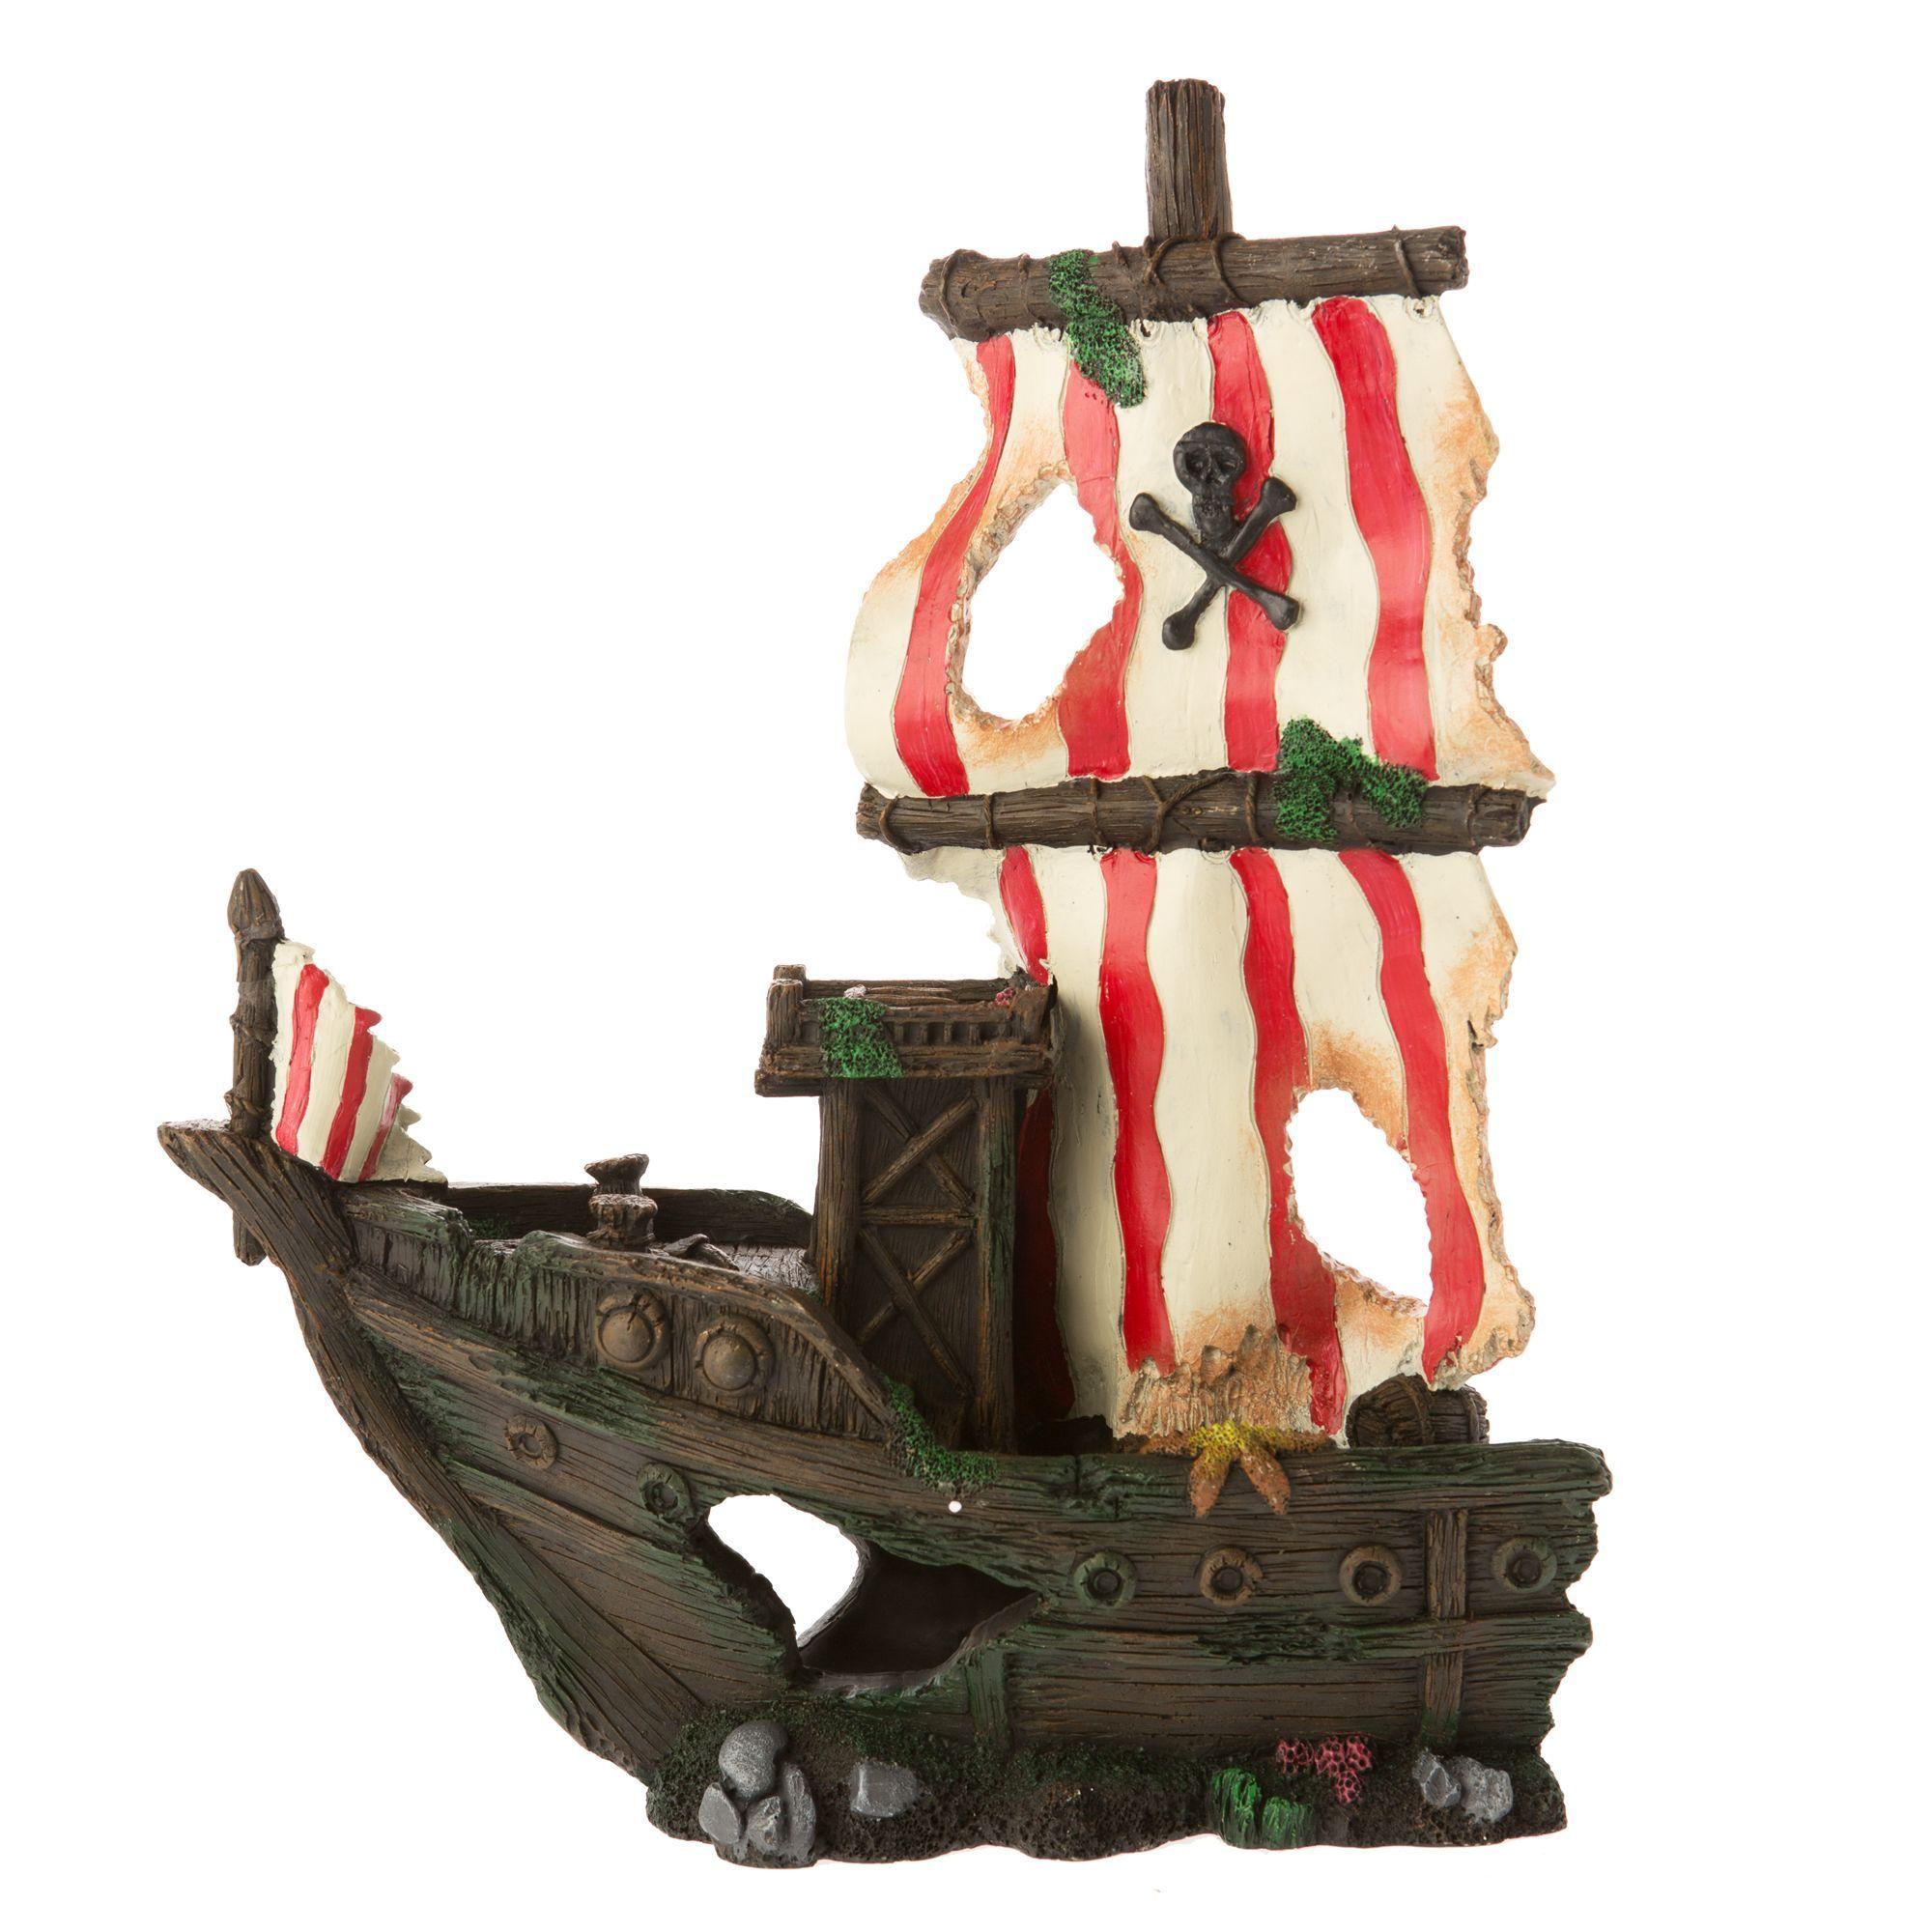 Top Fin Sunken Pirate Ship Aquarium Ornament Products Aquarium